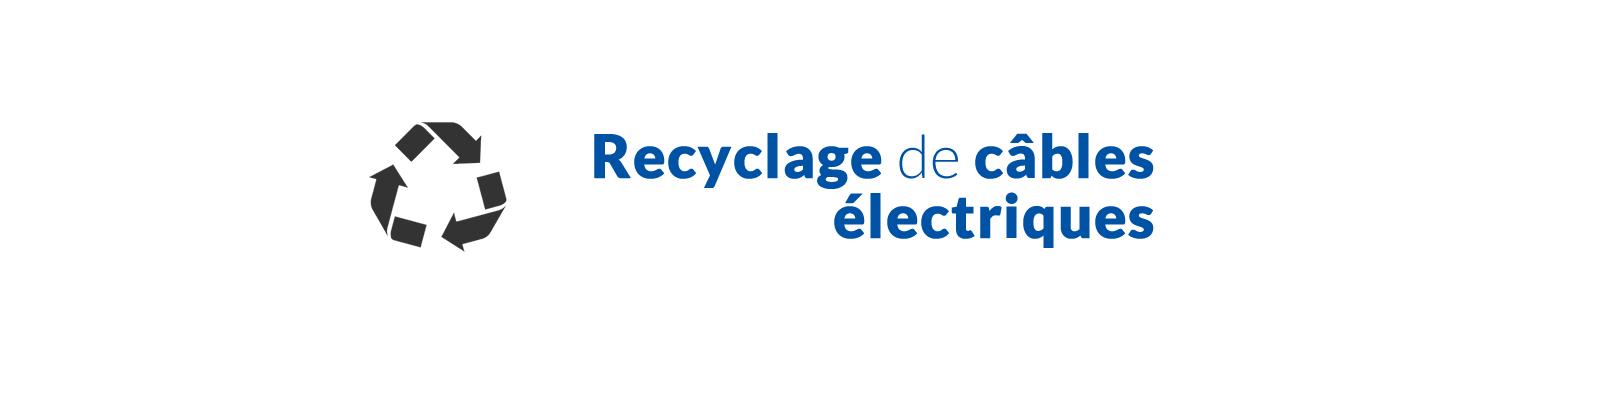 recyclage cable electrique